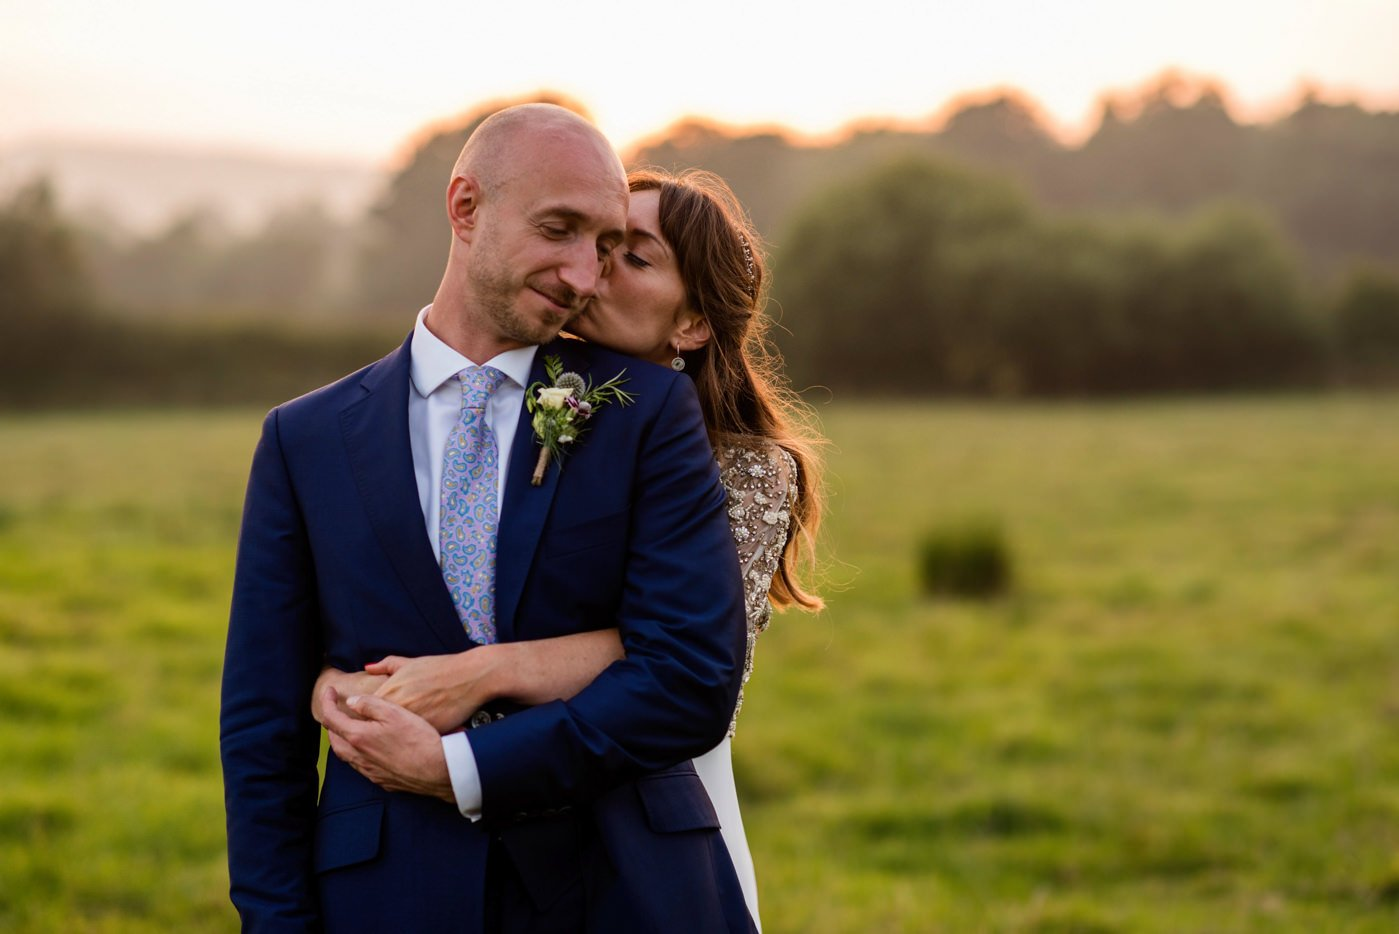 bignor-park-wedding-photography-robyn-and-tom-103